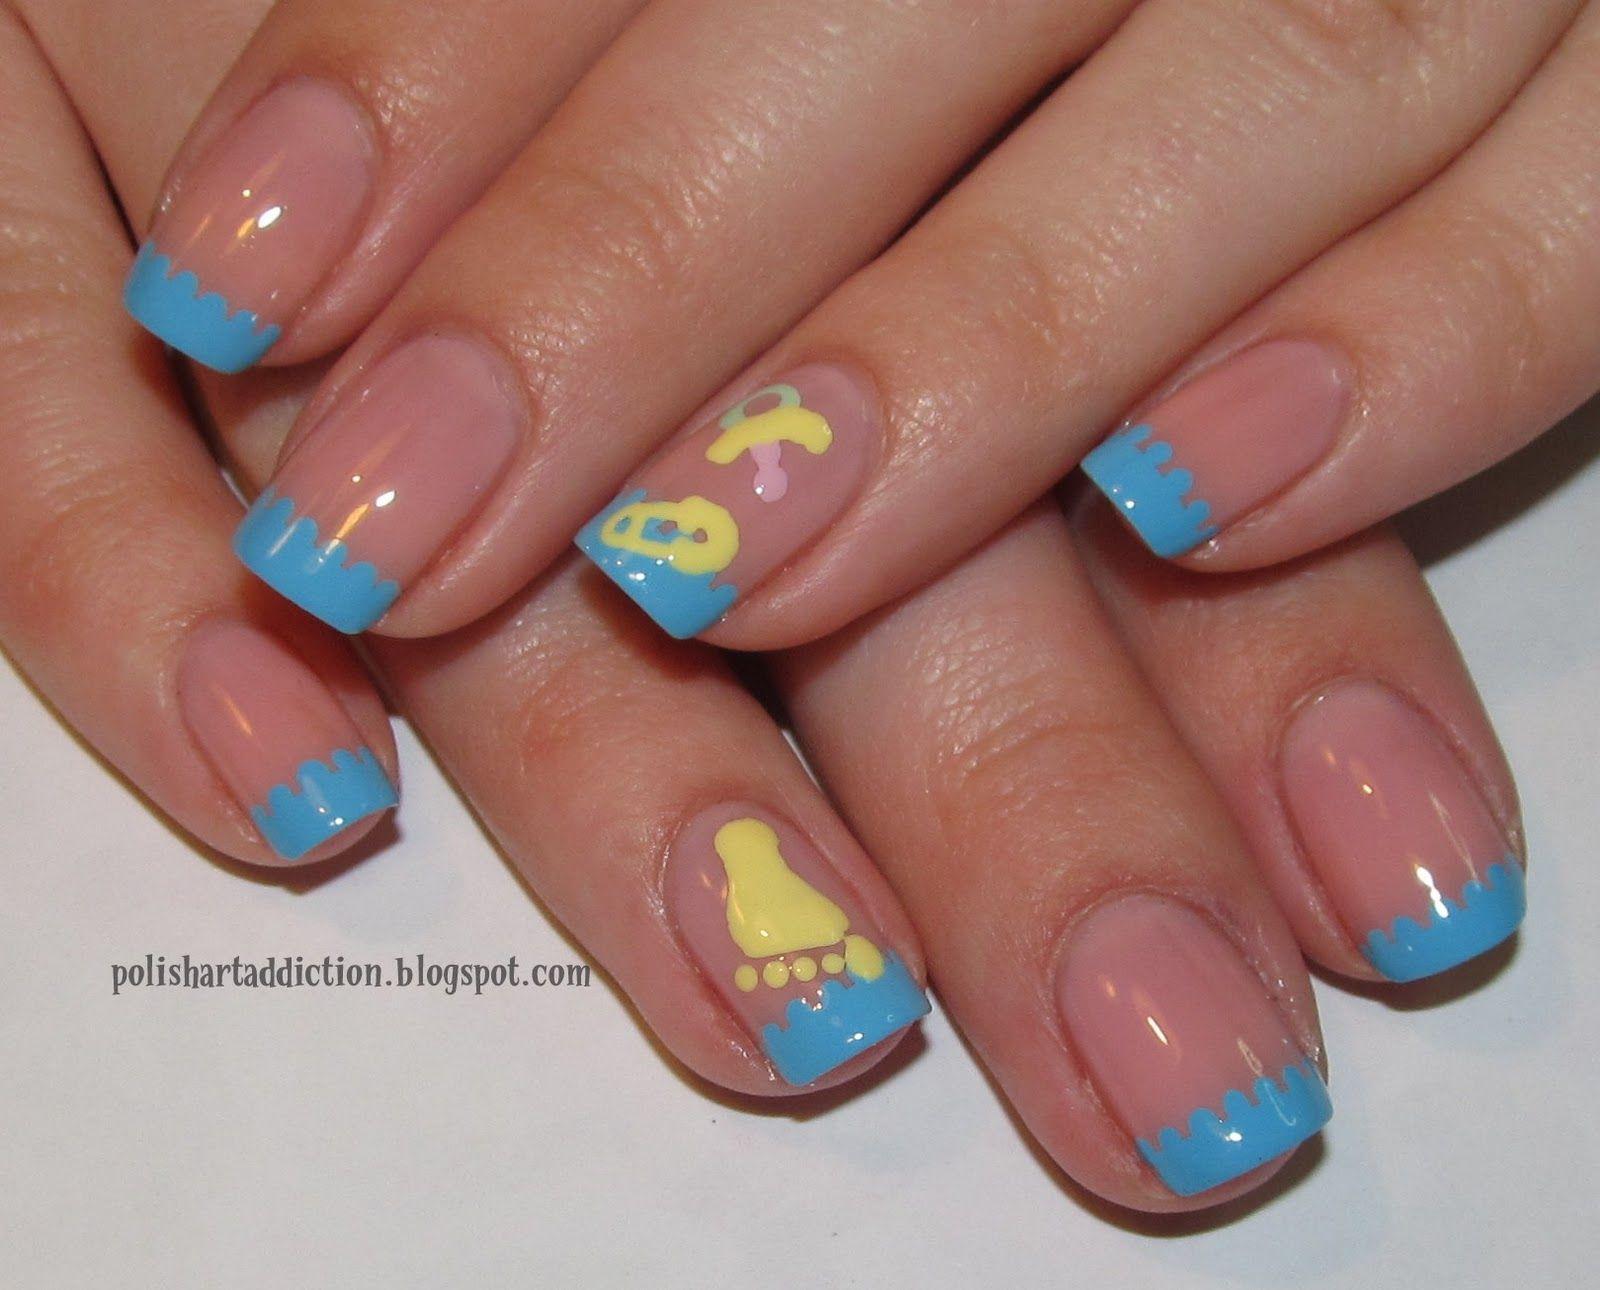 Dorable Svg Arte De Uñas Imagen - Ideas de Diseño de Arte de Uñas ...